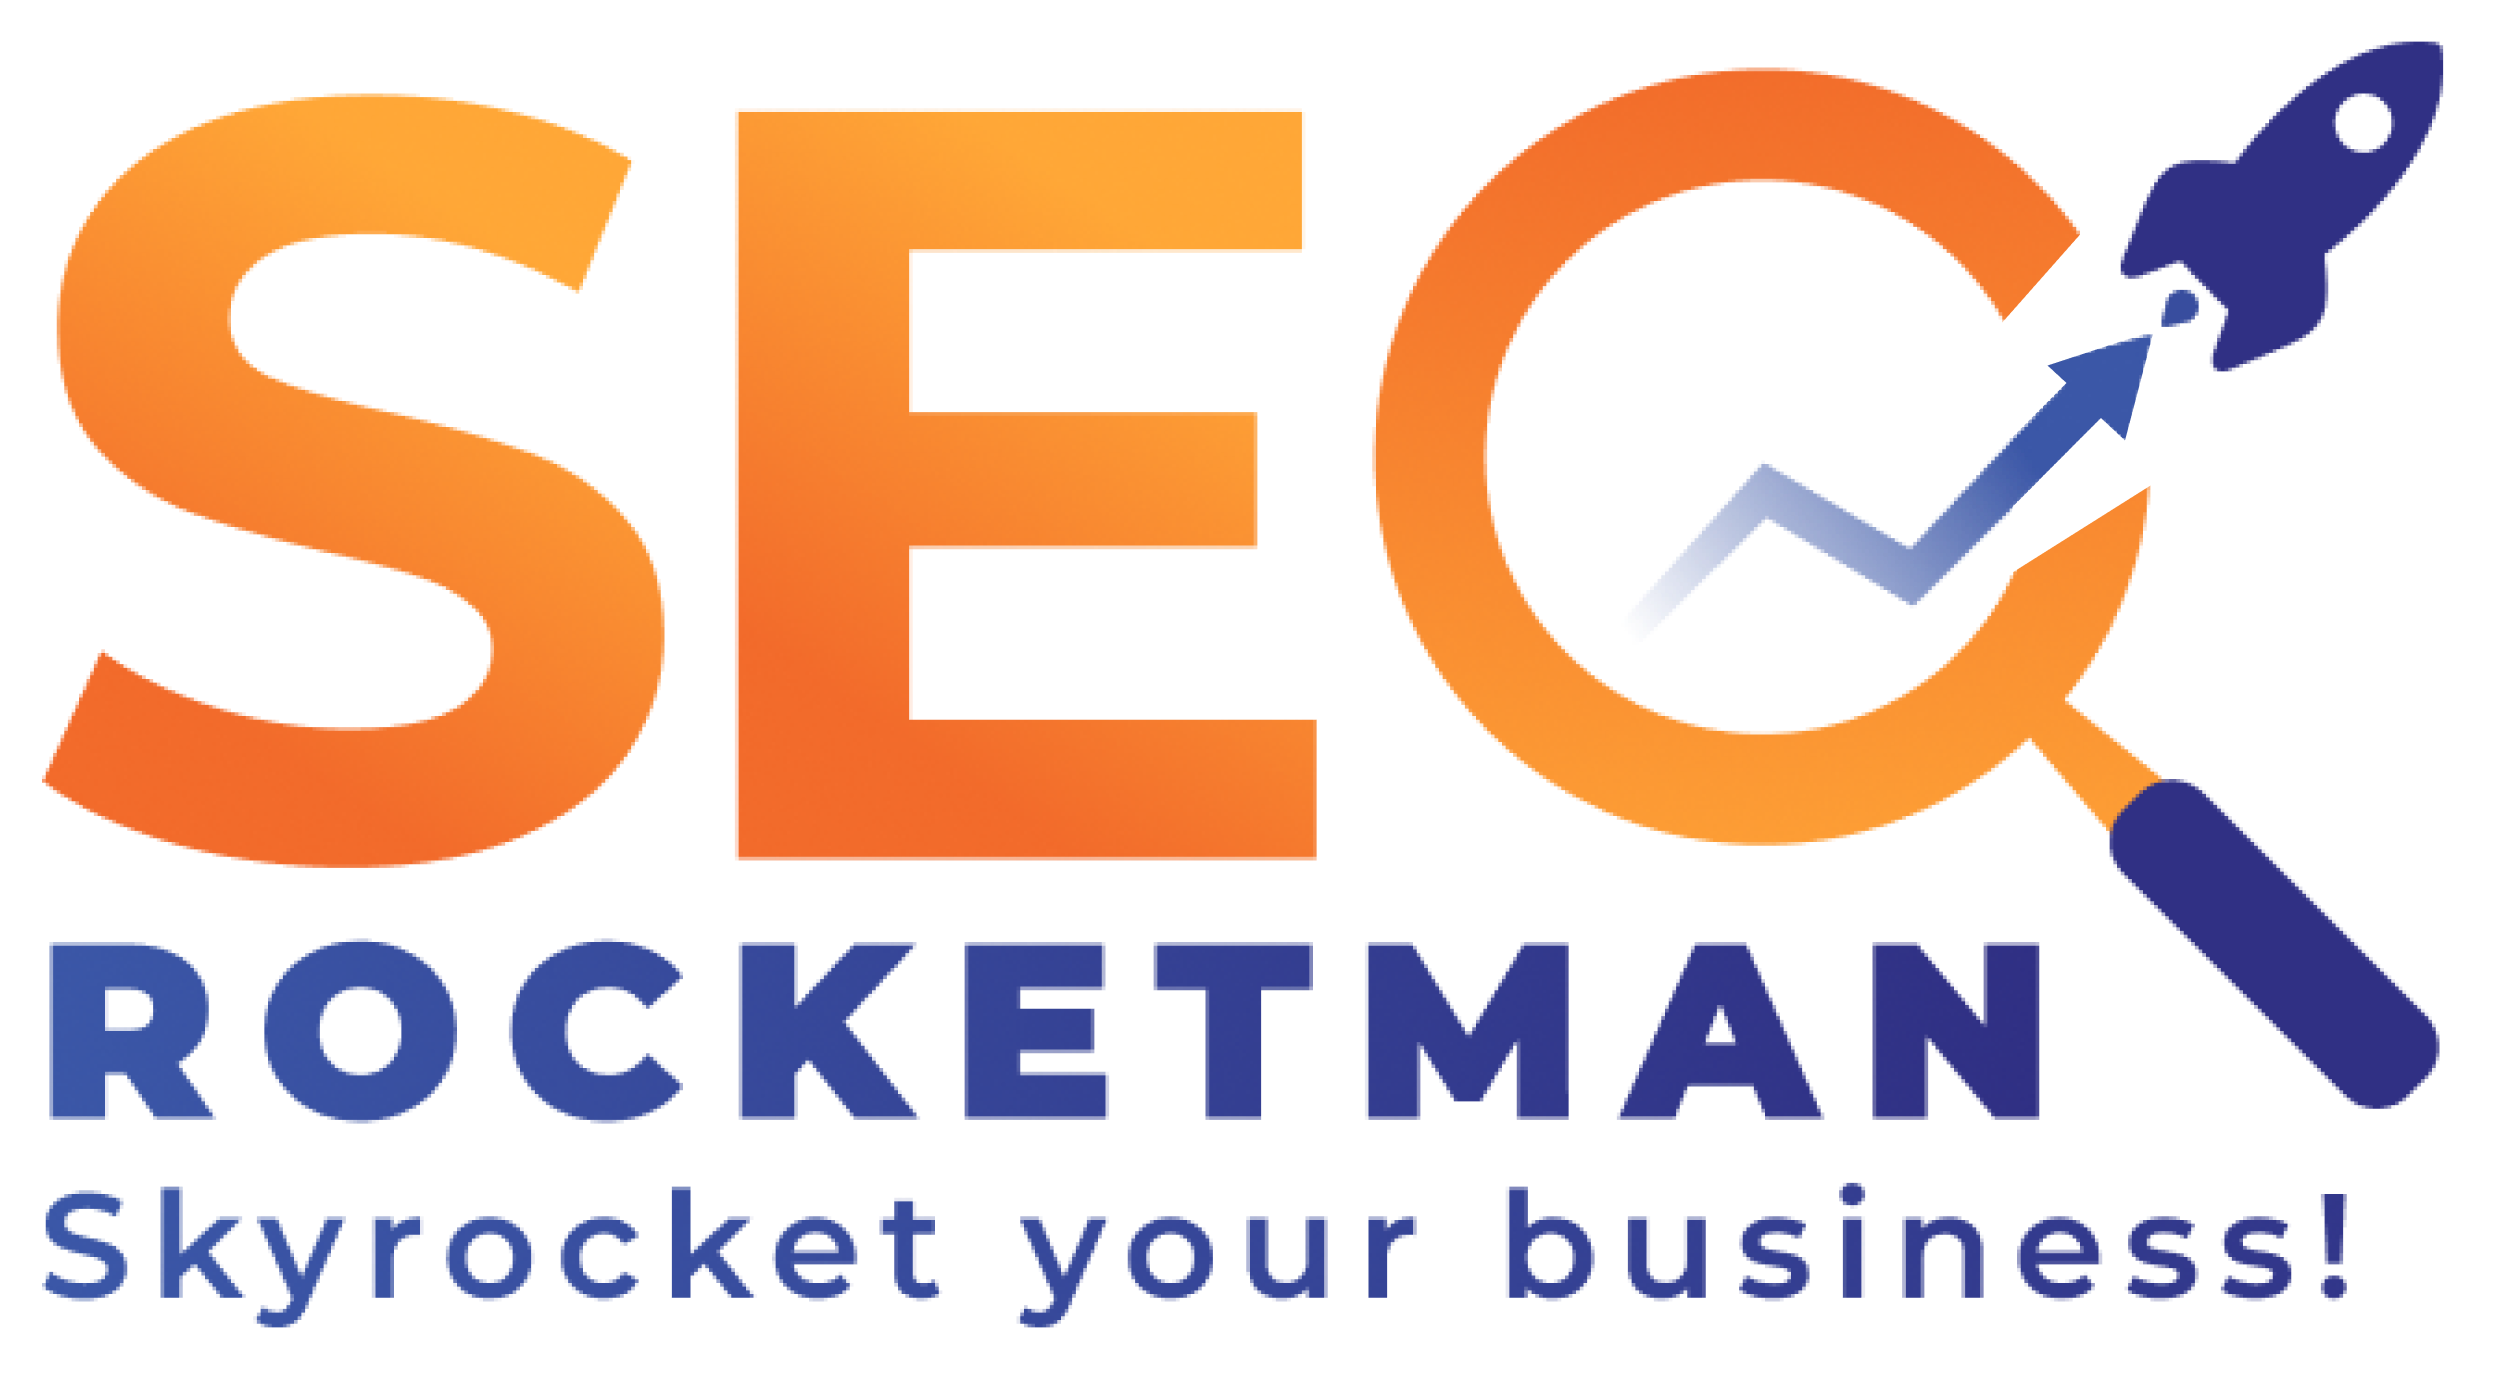 seorocketman.com Logo